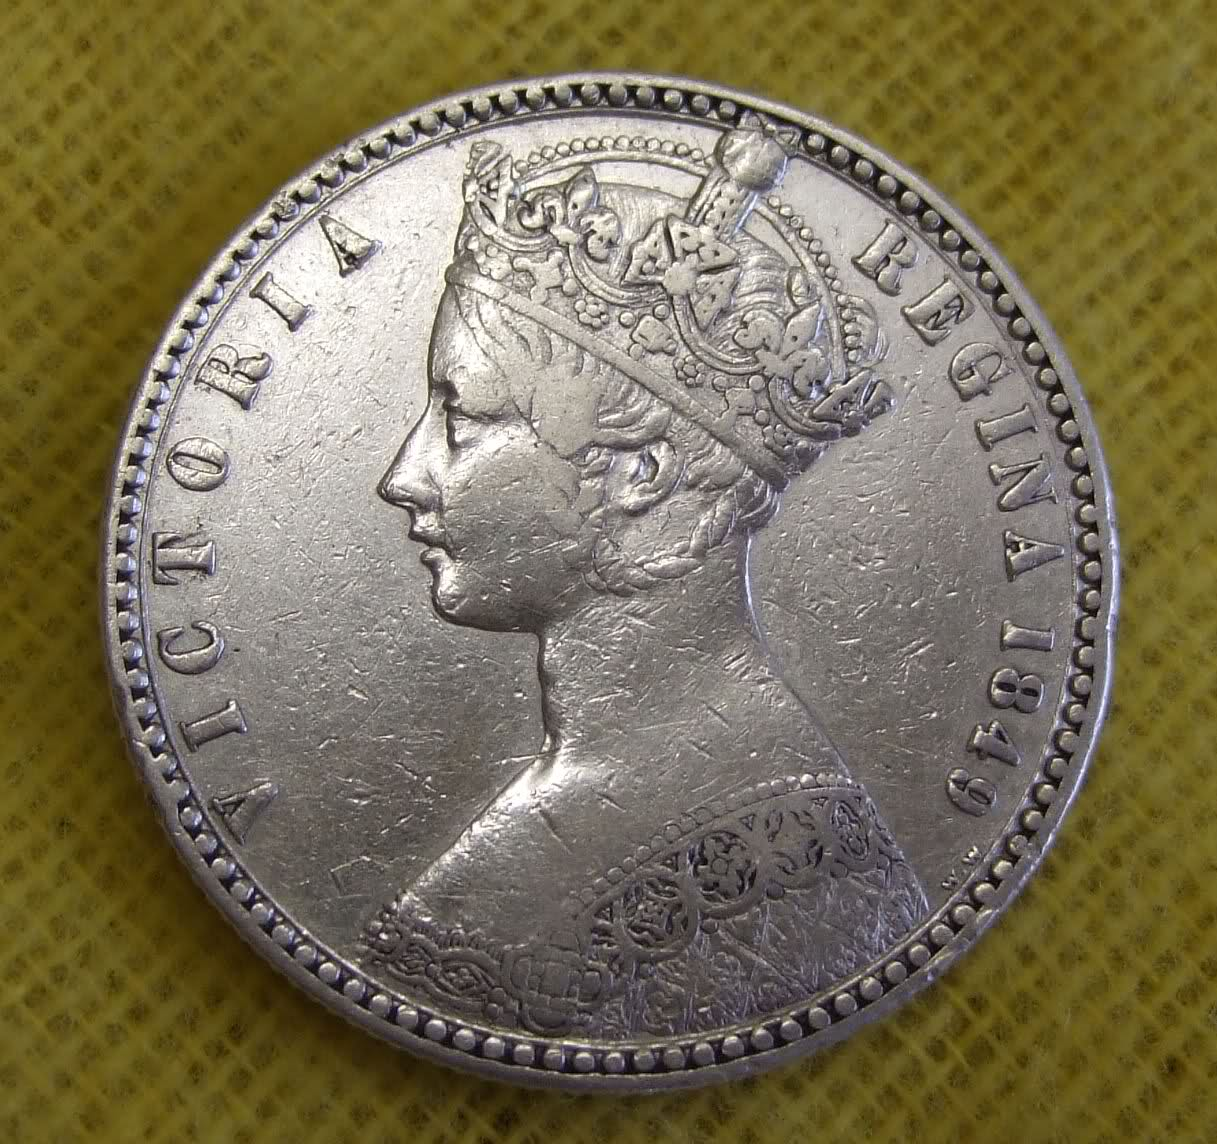 Rare coins of queen victoria - Speed up token limit keyboard